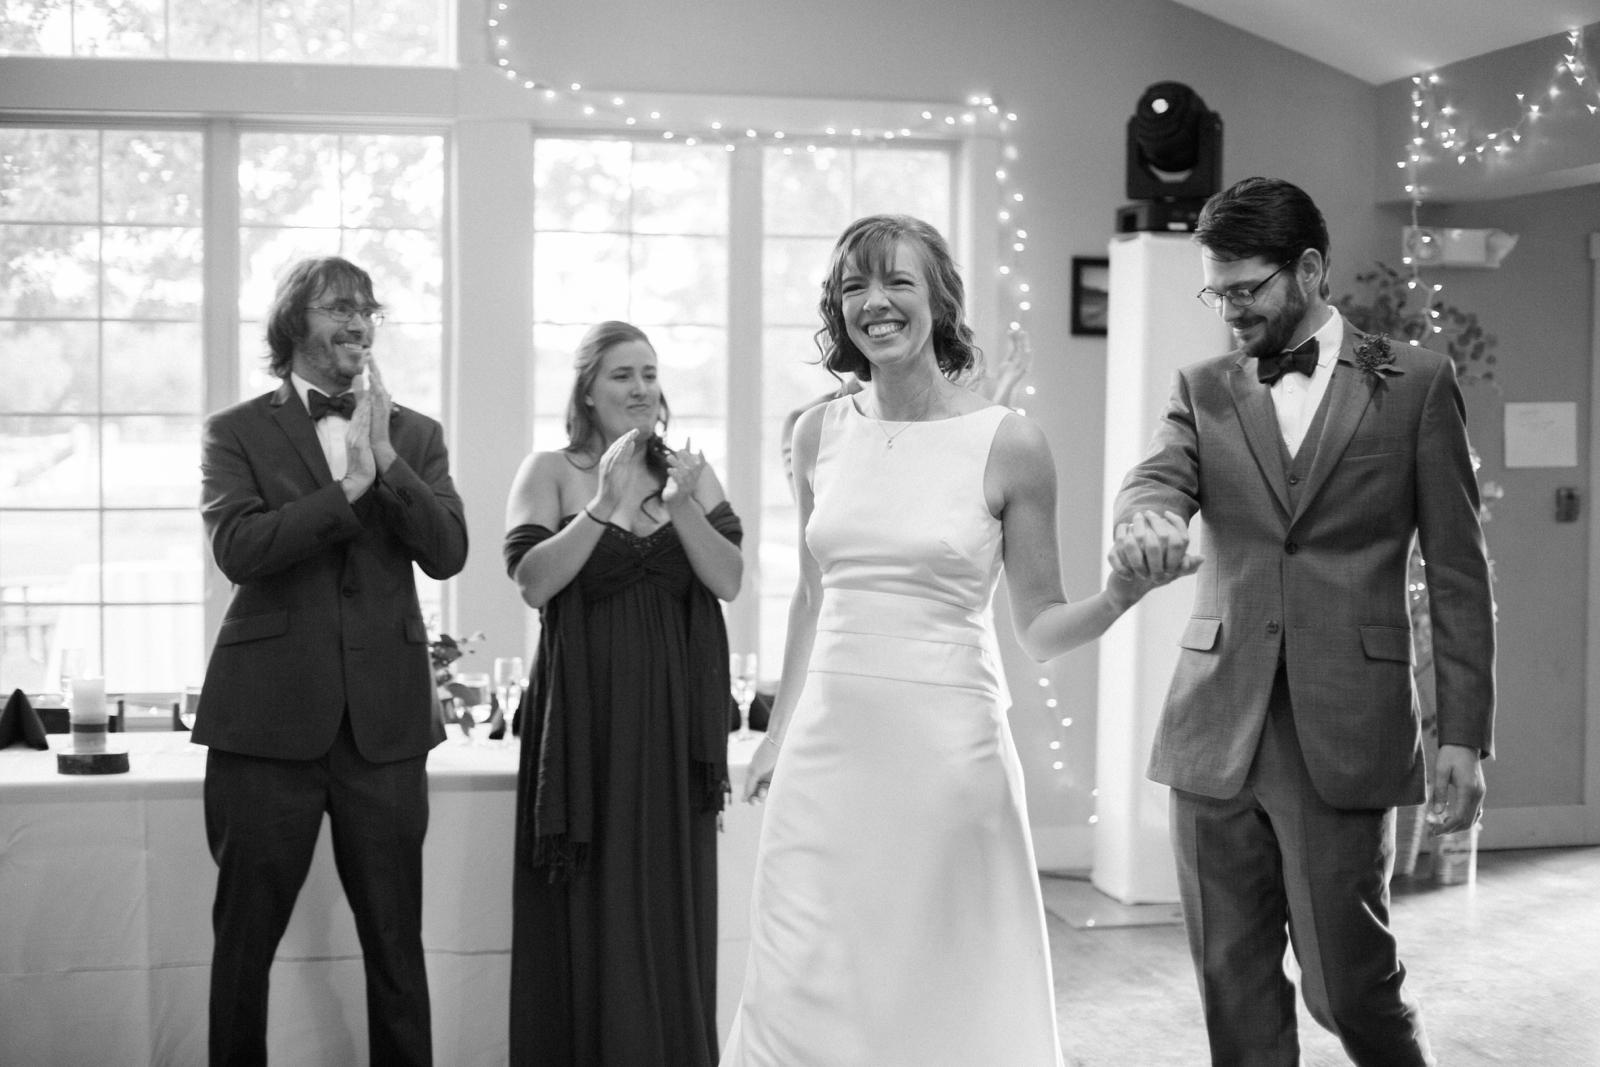 ringwood new jersey wedding photographer shannon griffin_0032.jpg